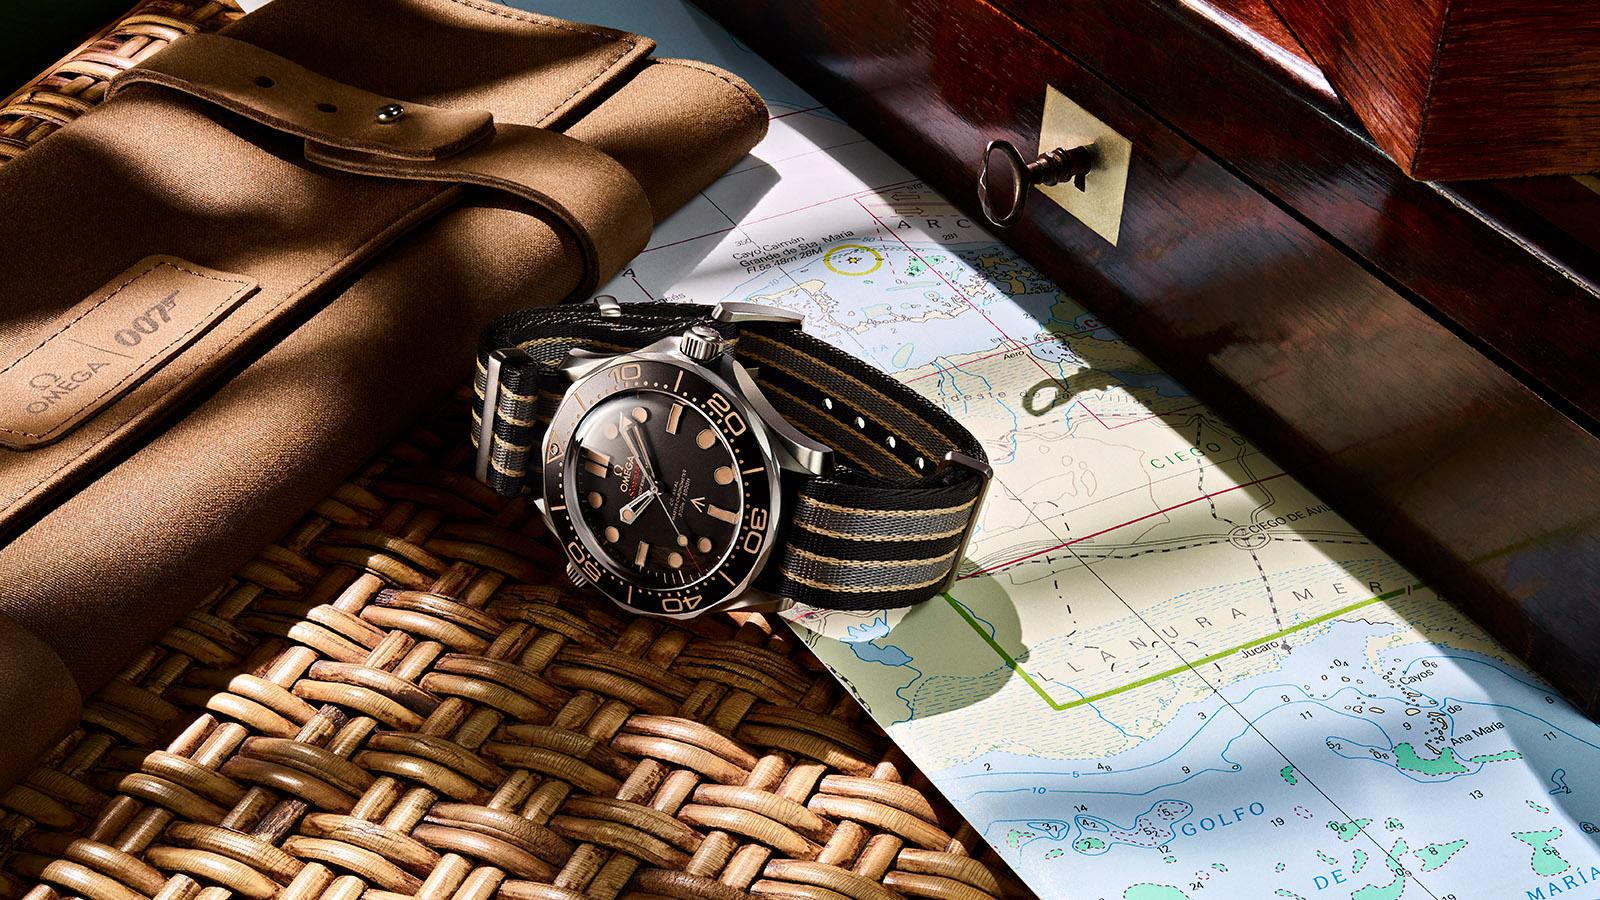 omega-diver-300m-007-edition-kingstown-mood-large